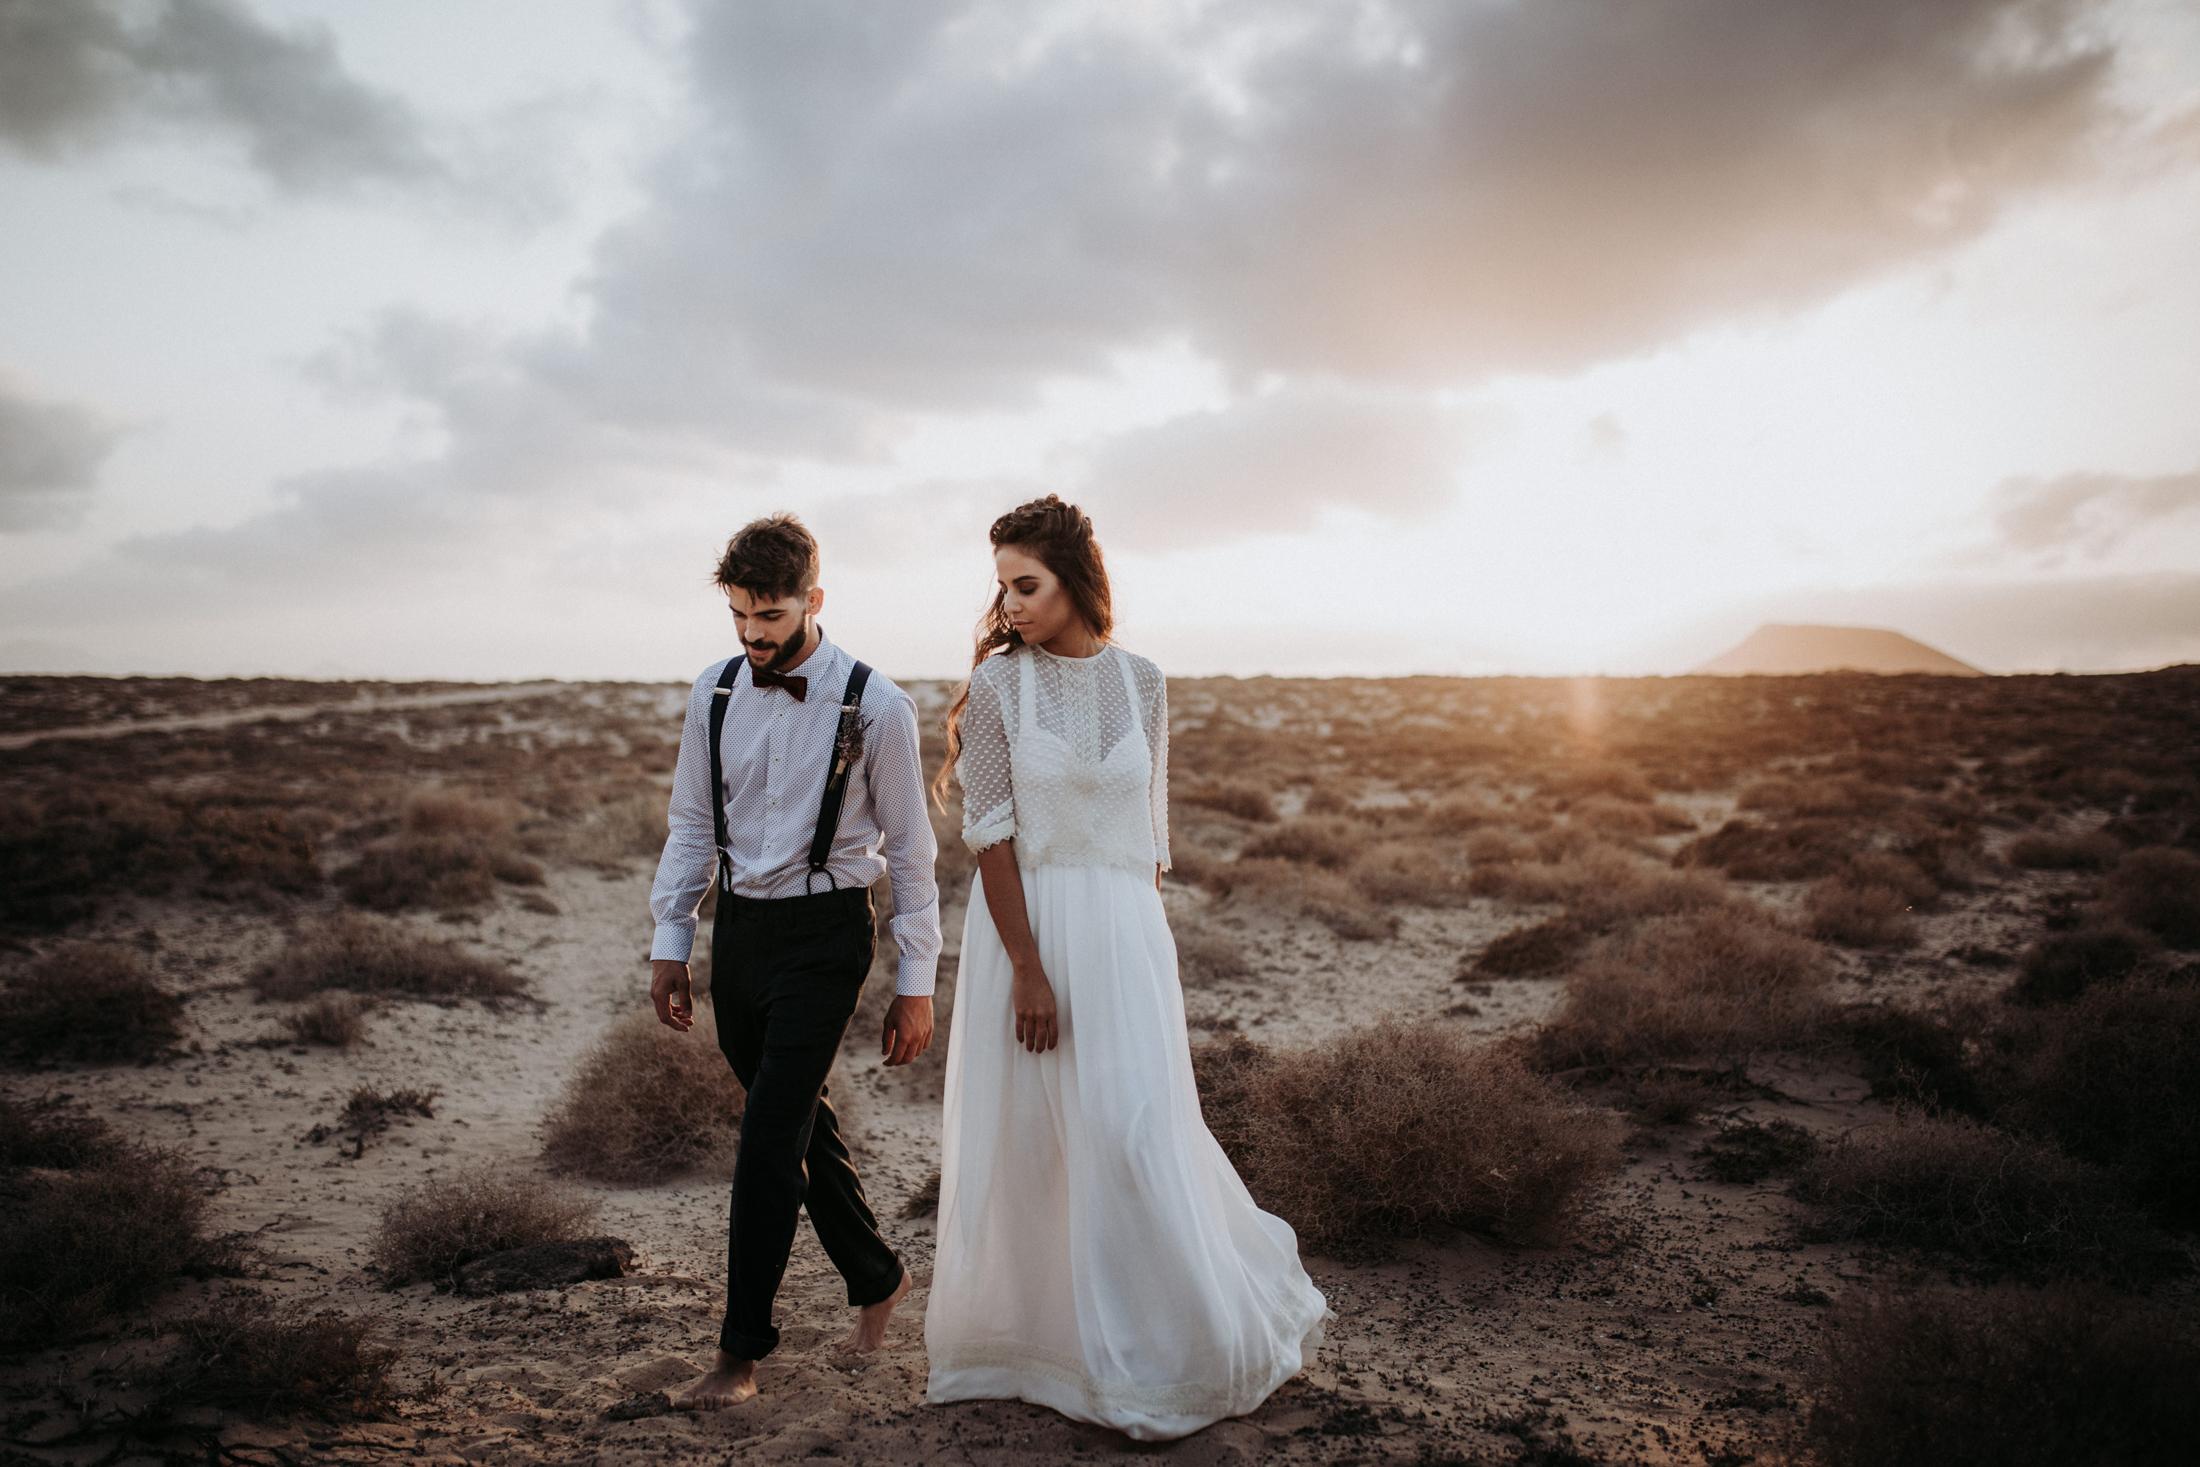 Wedding_Photographer_Mallorca_Daniela-Marquardt_Photography_CanaryIslands_Lanzarote_Iceland_Tuskany_Santorini_Portugal_Schweiz_Austria_Bayern_Elopement_Hochzeitsfotograf_13